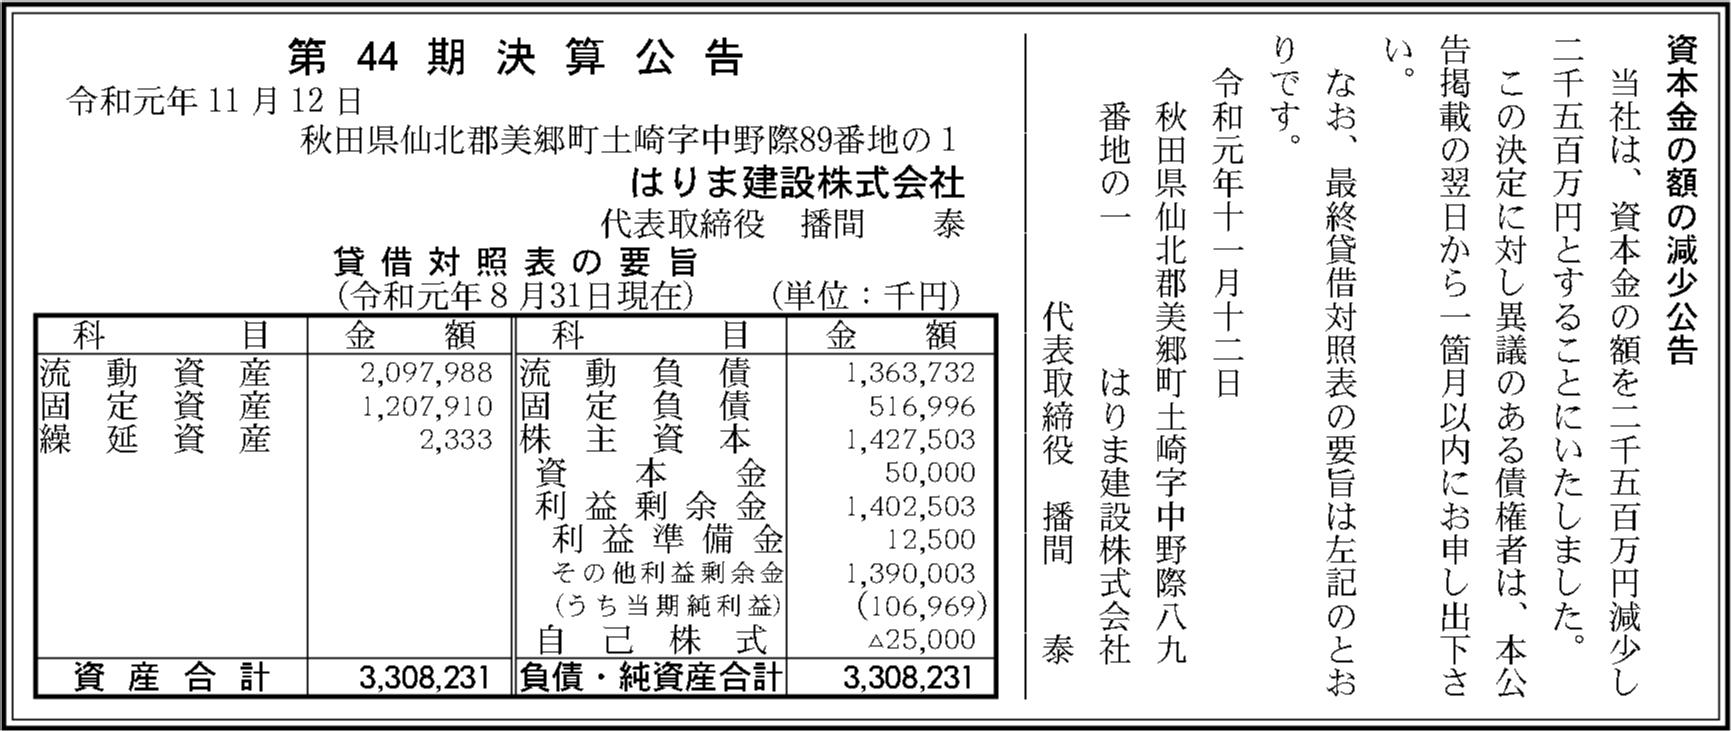 0060 faf8b73046aaf345286fc949f349e5e57f9e37c195a1c49630ca5f2ec51c5b785cc819137ead81ec4df0ecfd099f86580b4b1c7392edb0174e2ed7e6cd34ace9 05